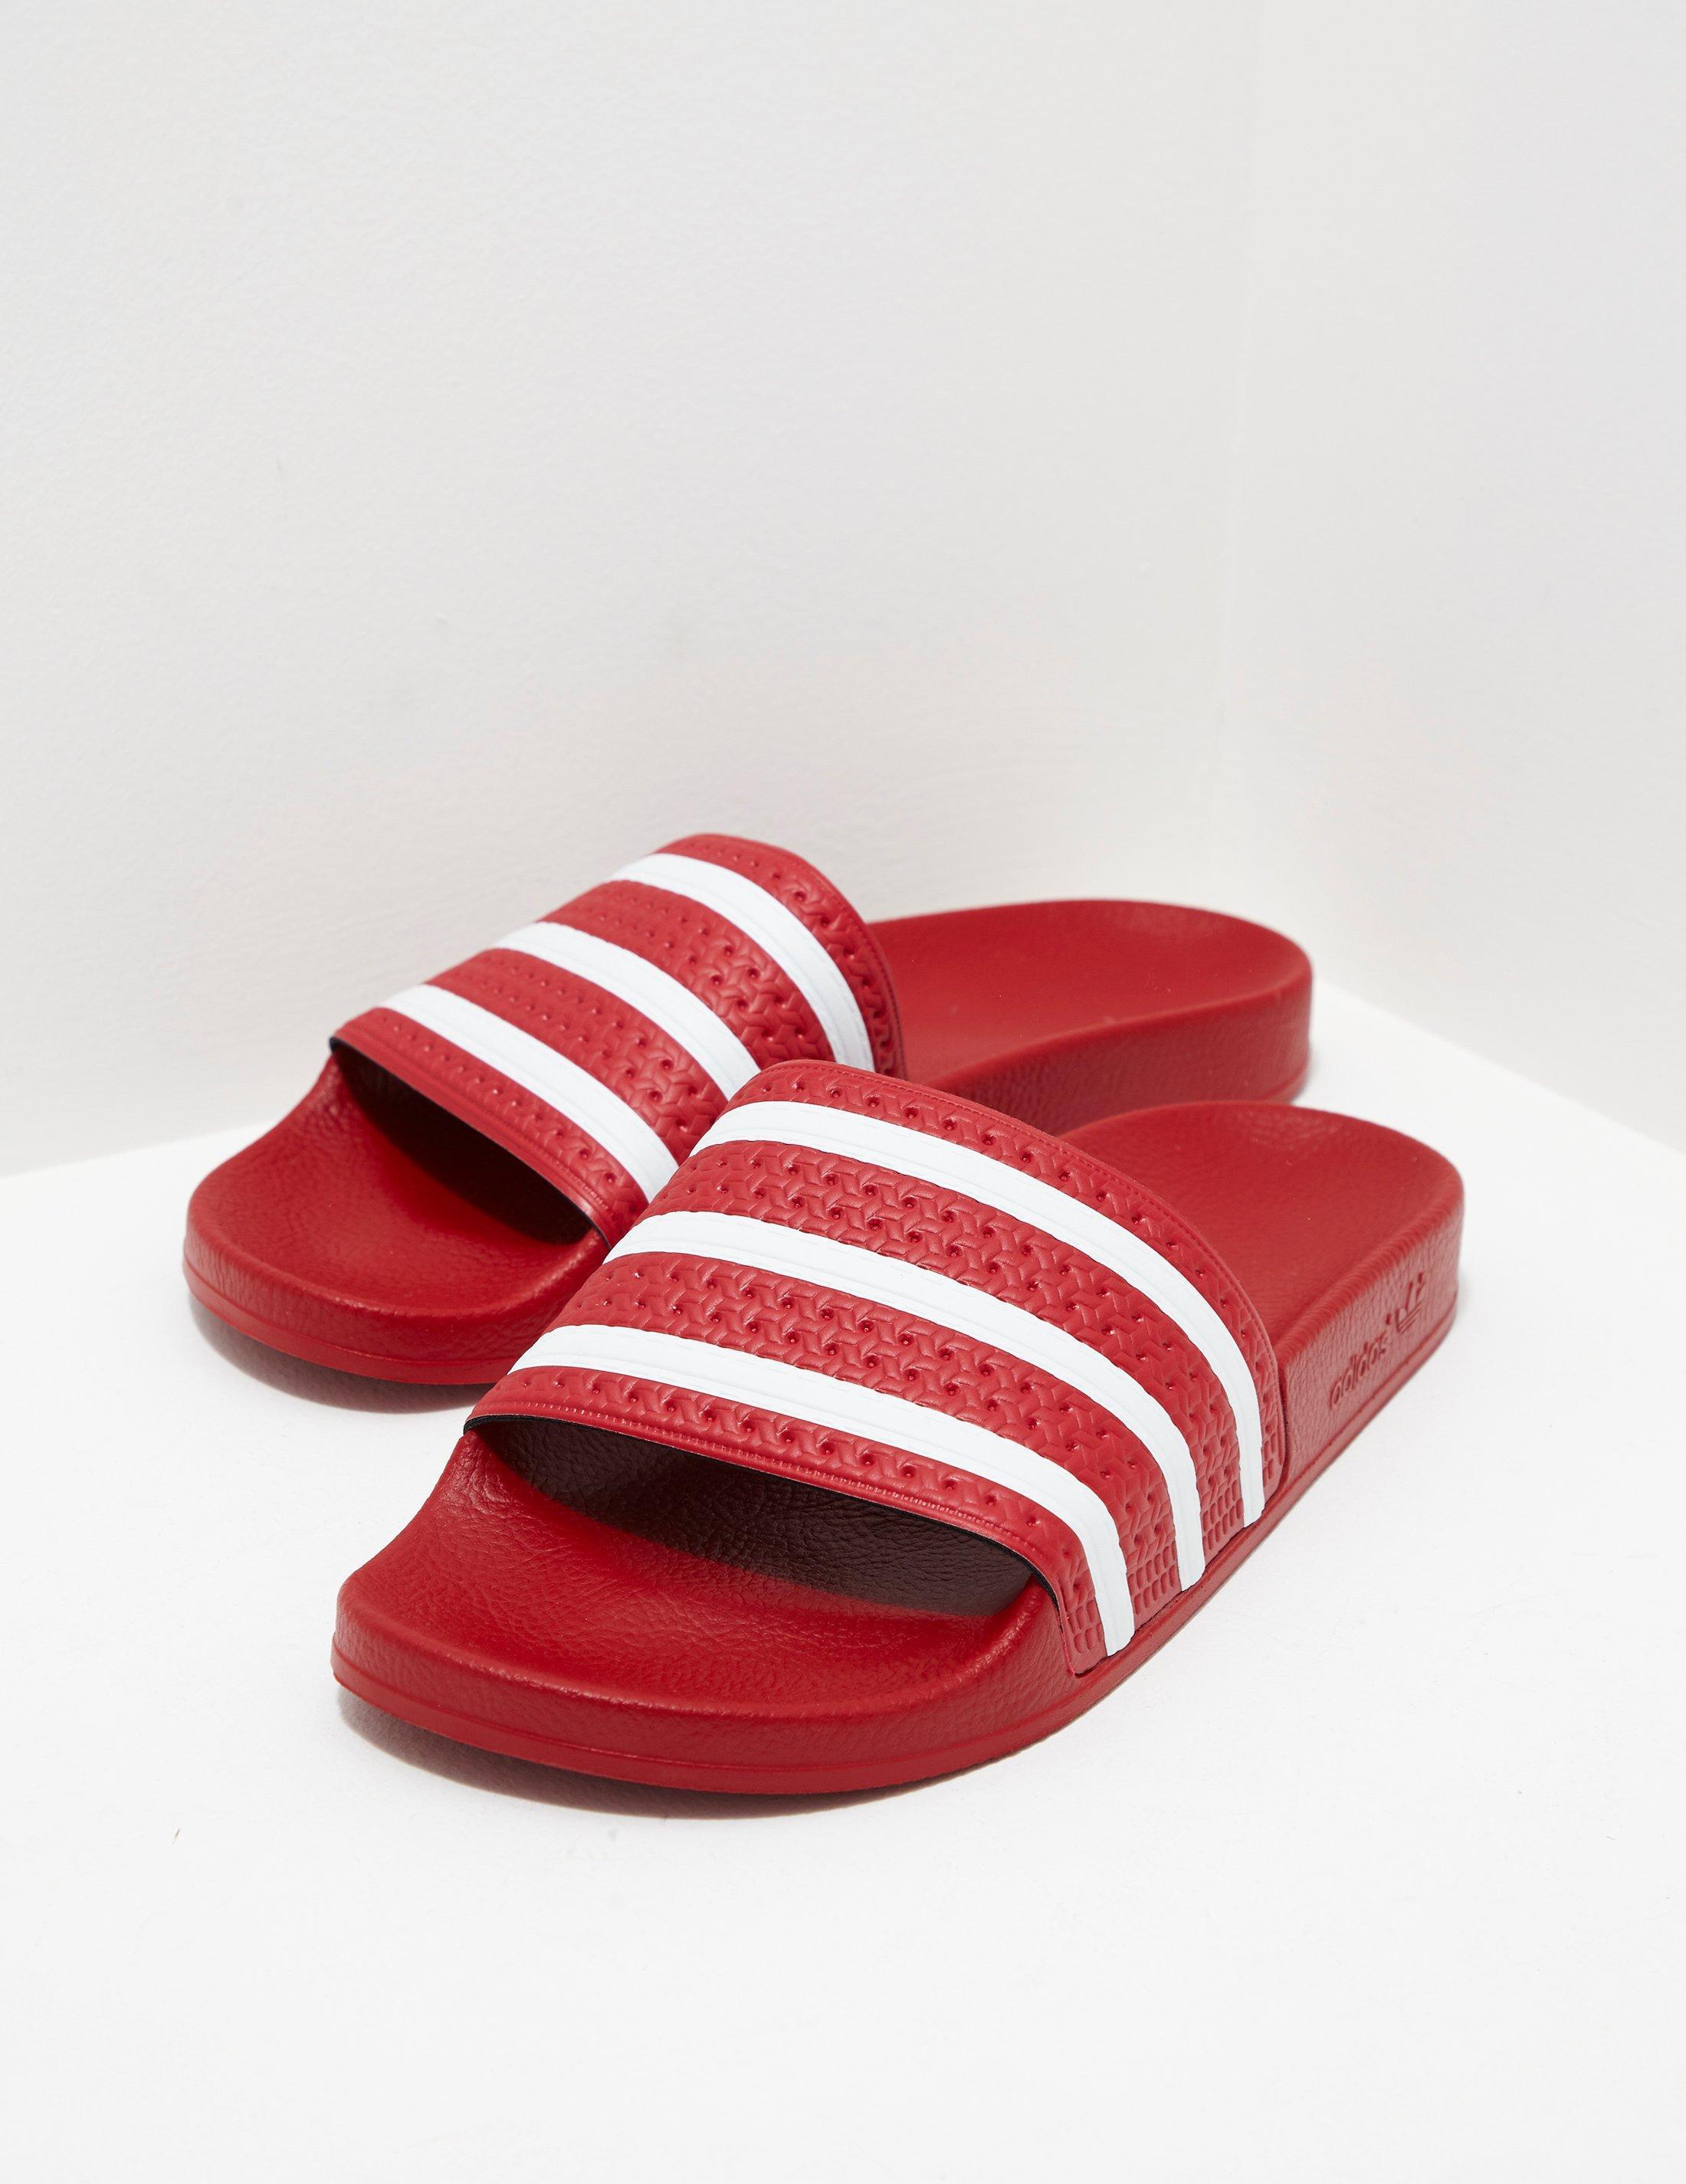 7eafca618c0a Lyst - adidas Originals Mens Adilette Slides Red in Red for Men